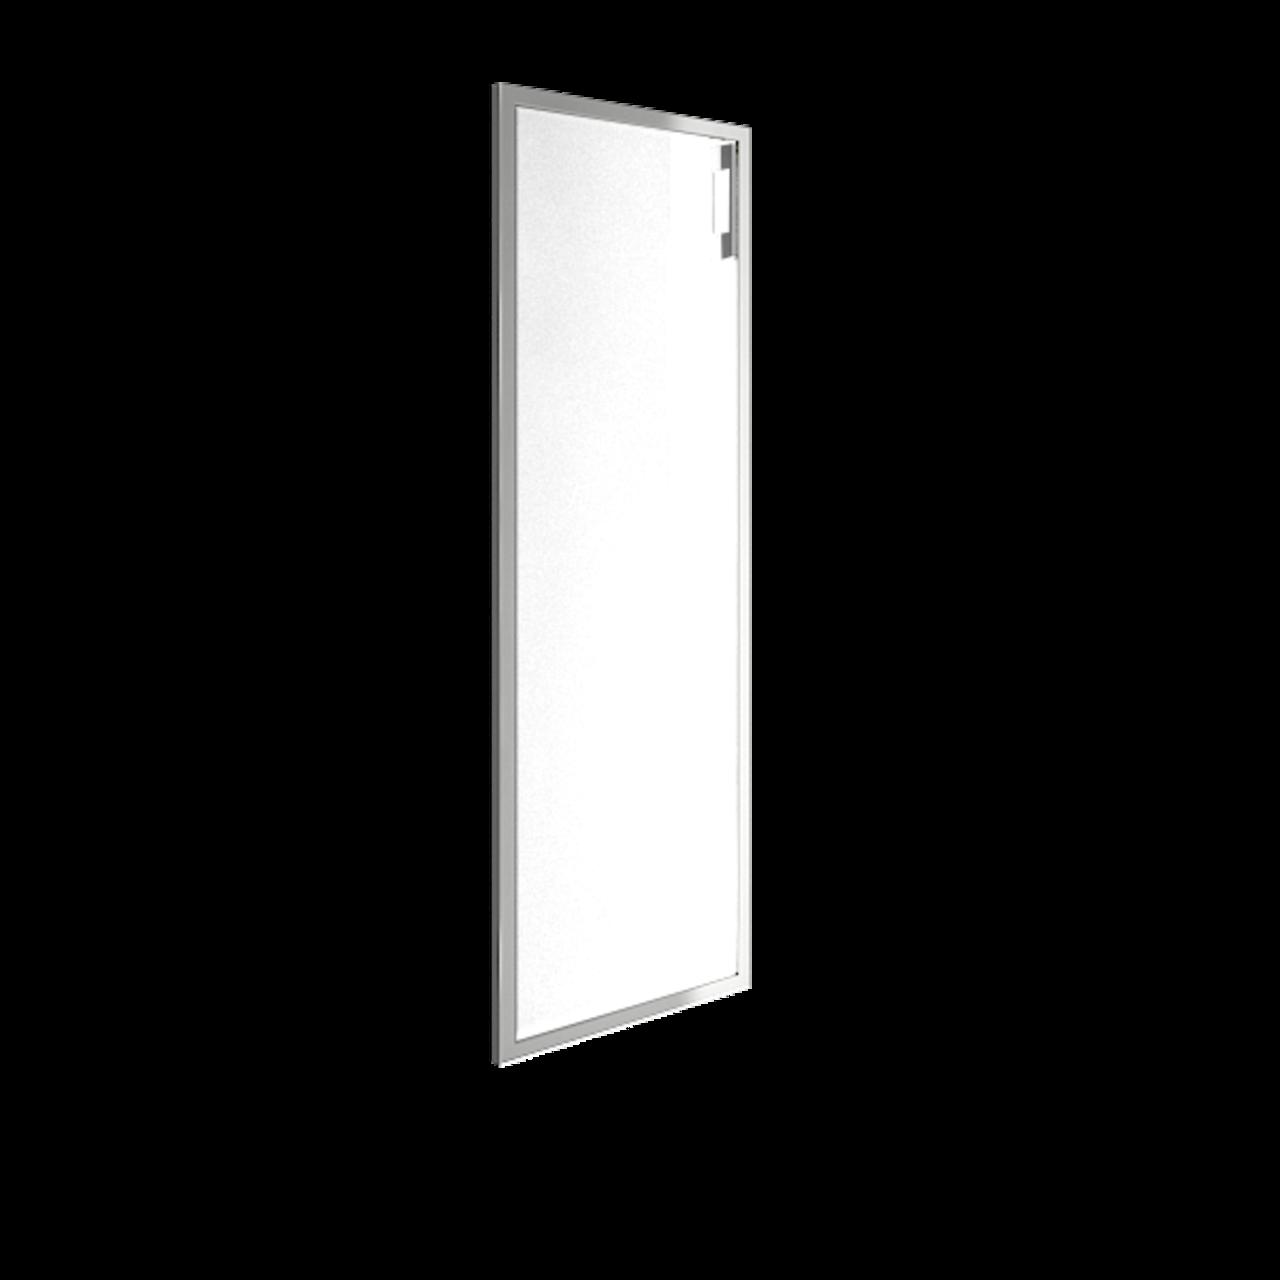 Дверь стекло в раме среднее Lacobel white левая - фото 4